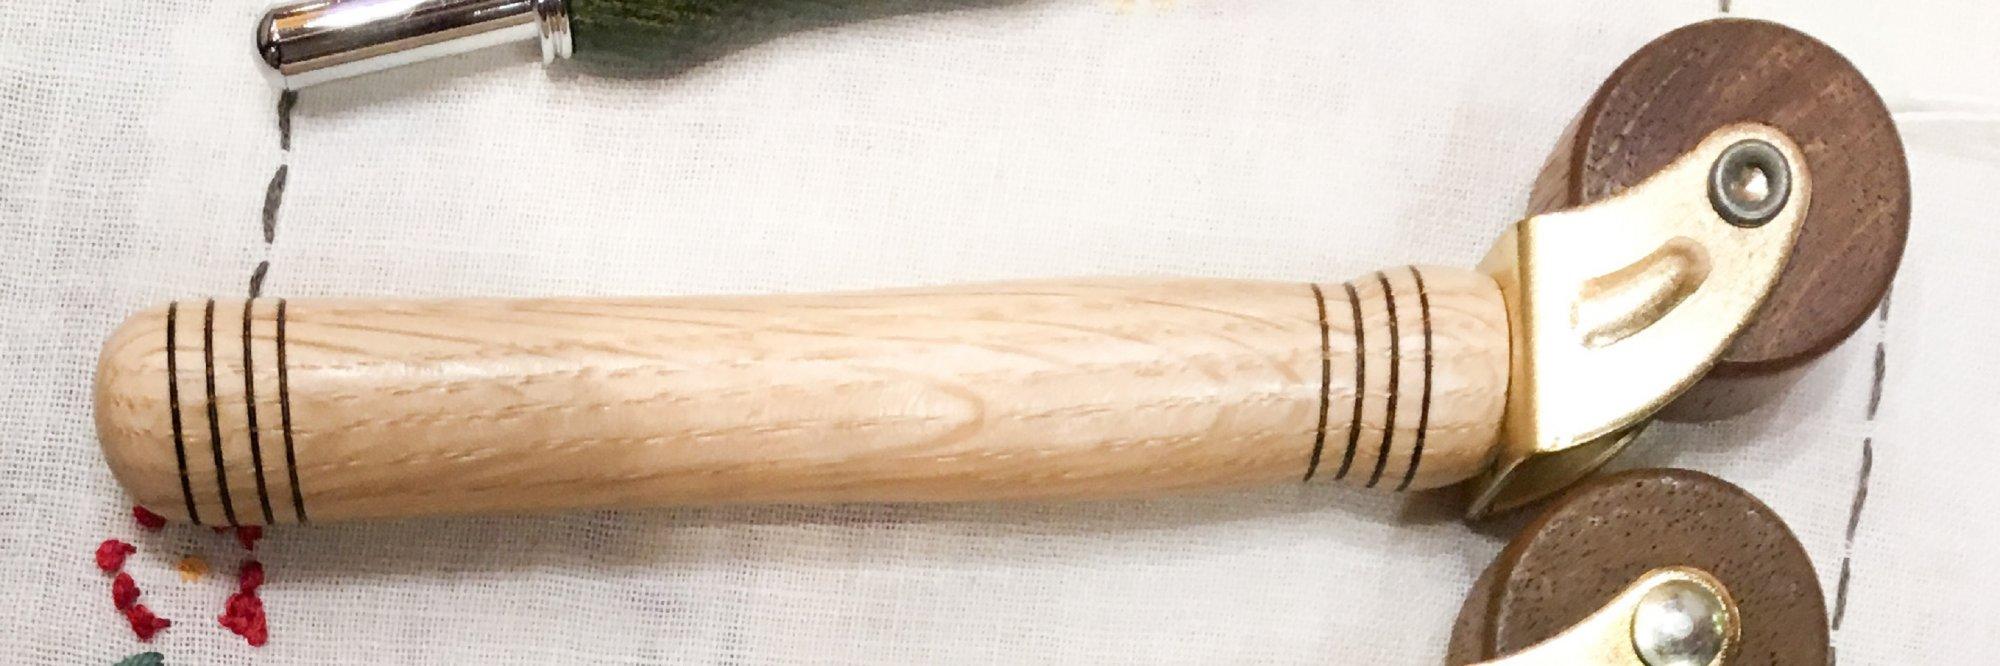 Wood Seam Roller - Maple